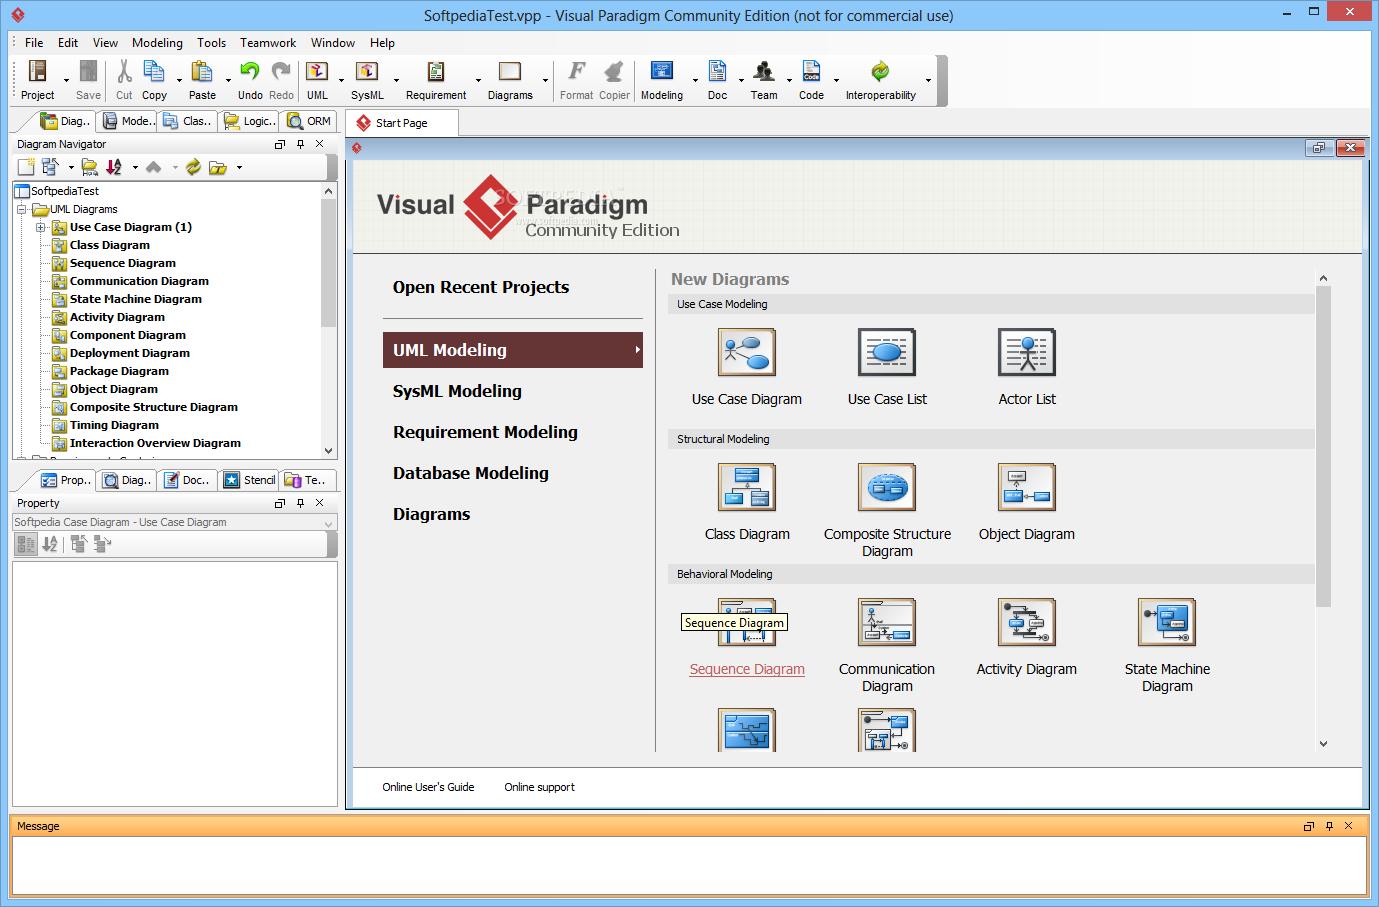 Visual Paradigm Tool Dashboard -- www.visual-paradigm.com | UML ...